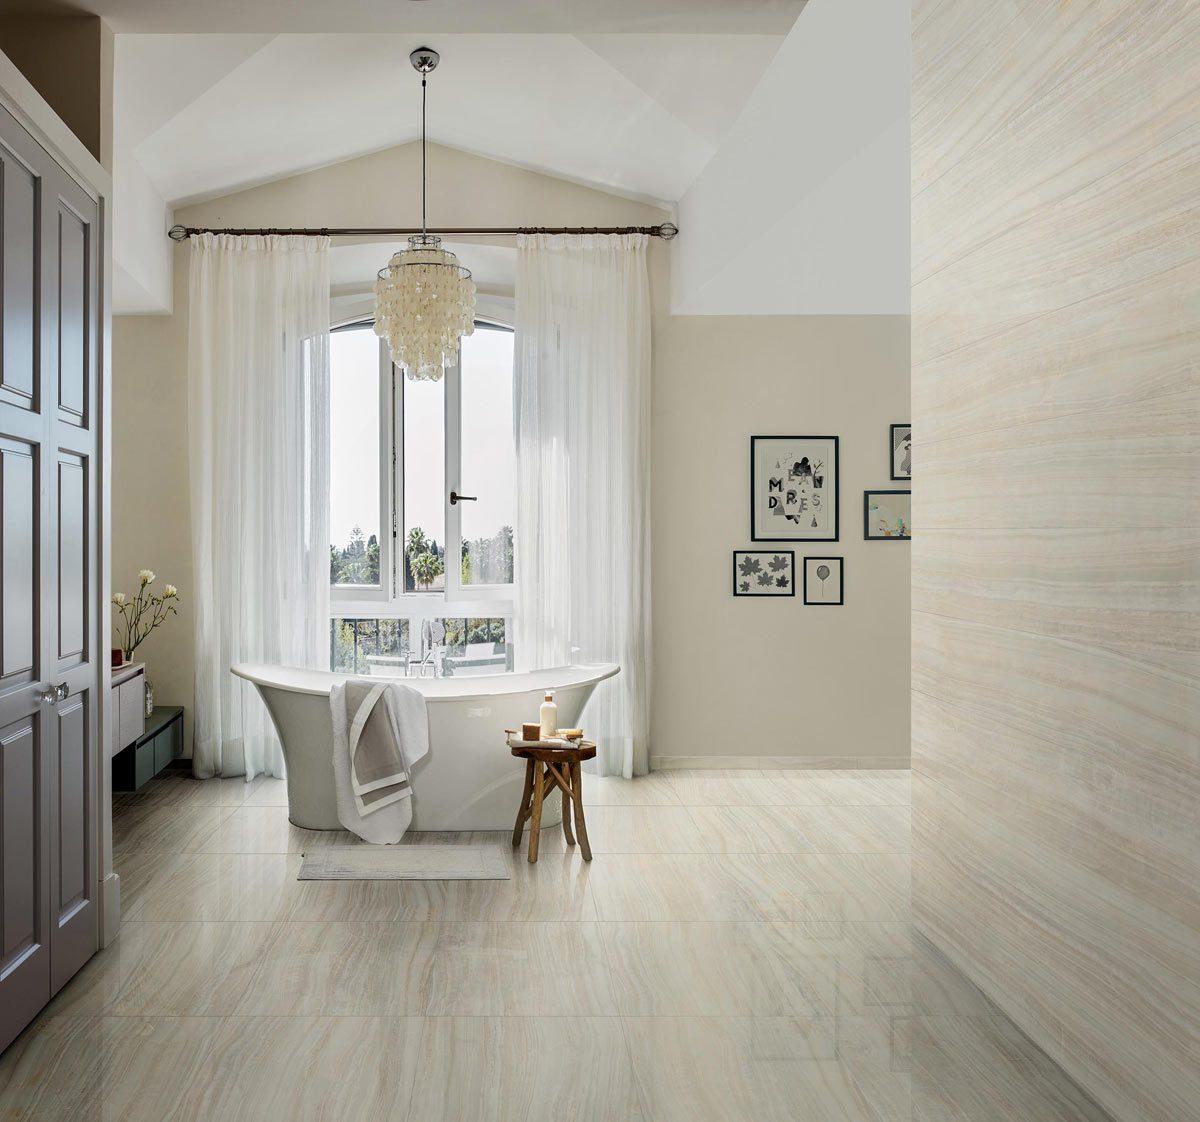 5 Trendy Design Ideas for a Dreamy Bathroom | btw - baths ... on Main Bathroom Ideas  id=89567